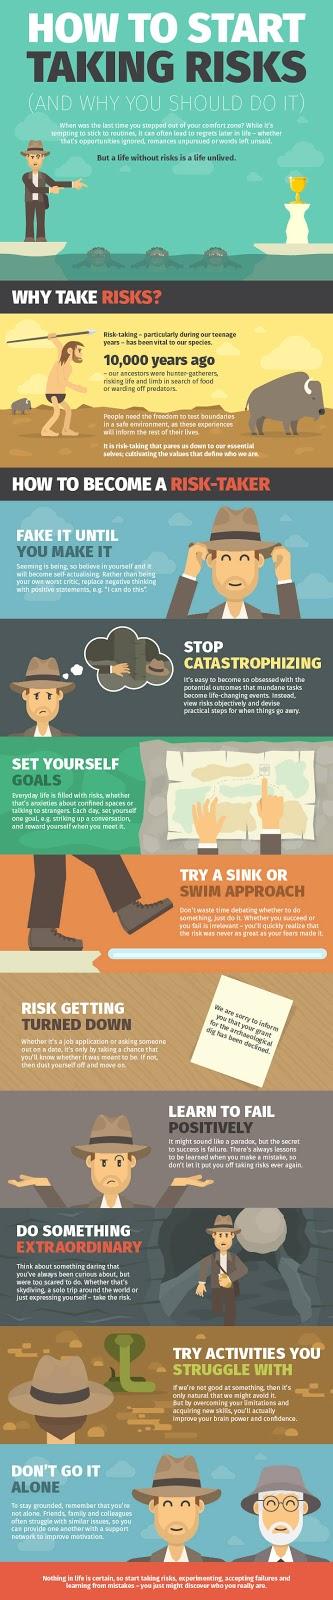 RushCube Benefits Of Risk Taking